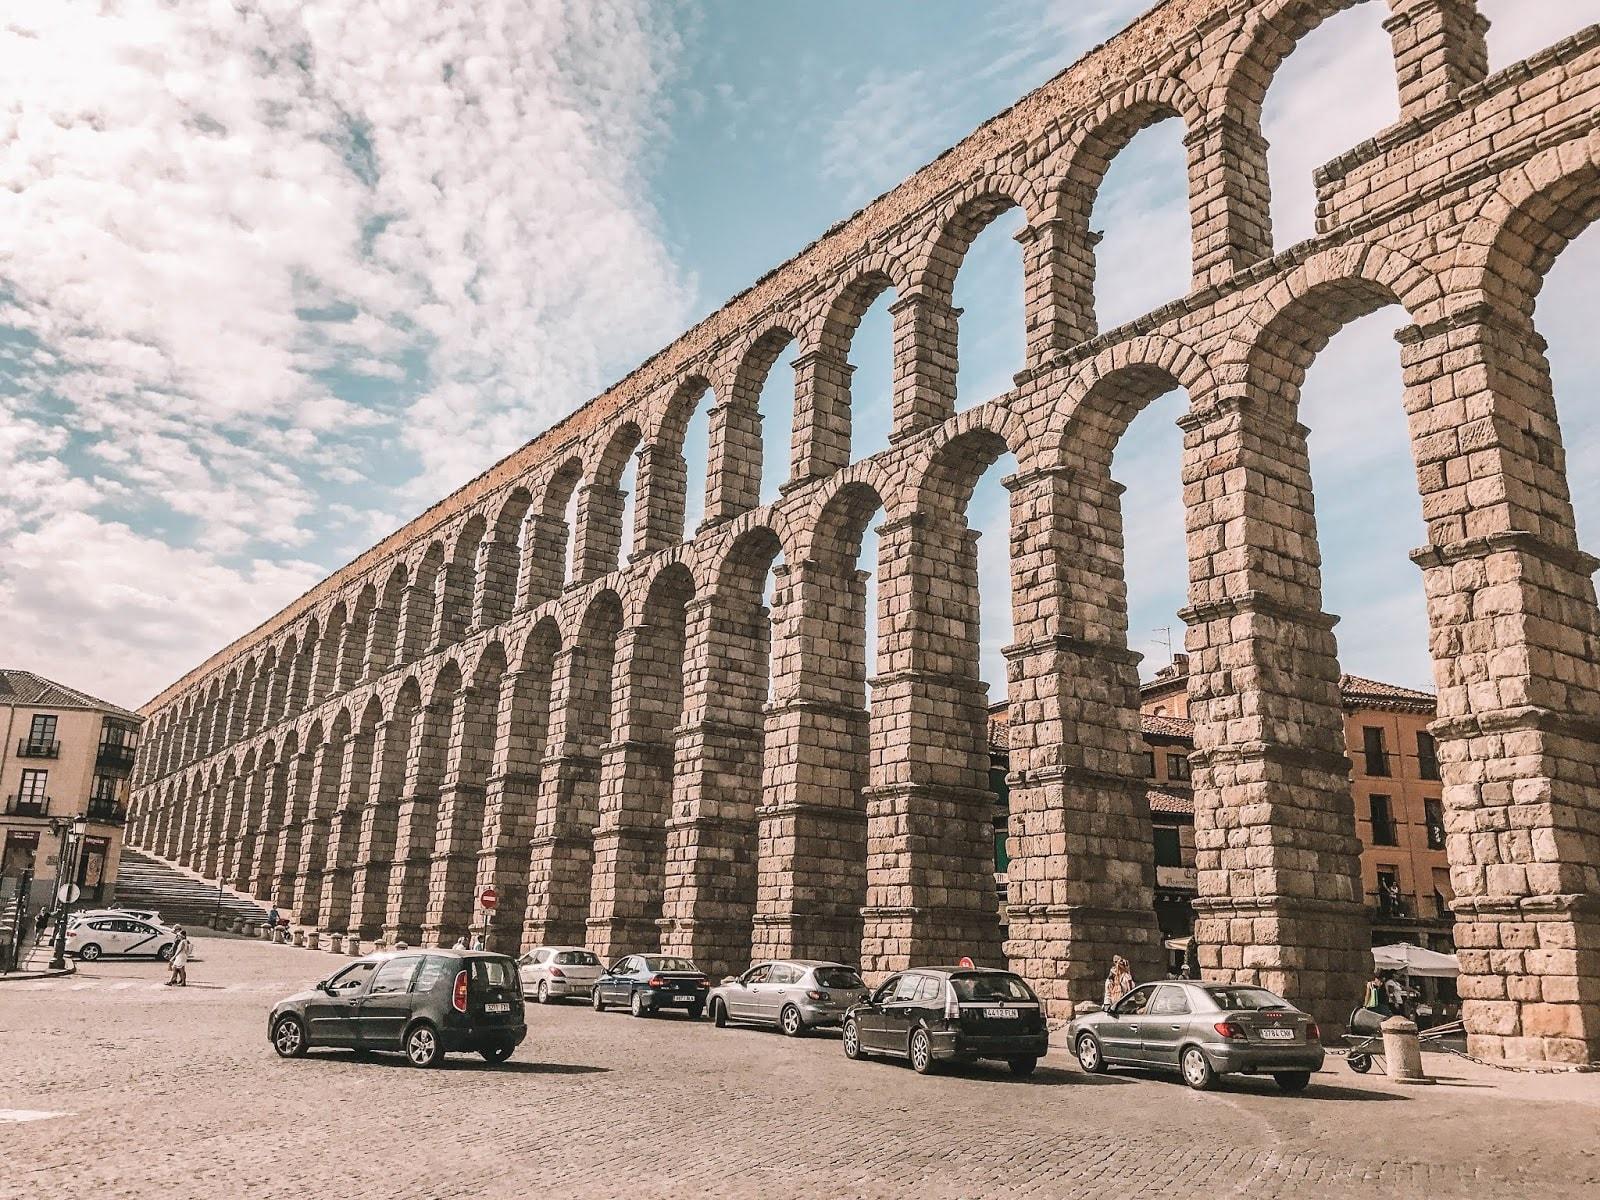 Roman Aqueduct Segovia Spain